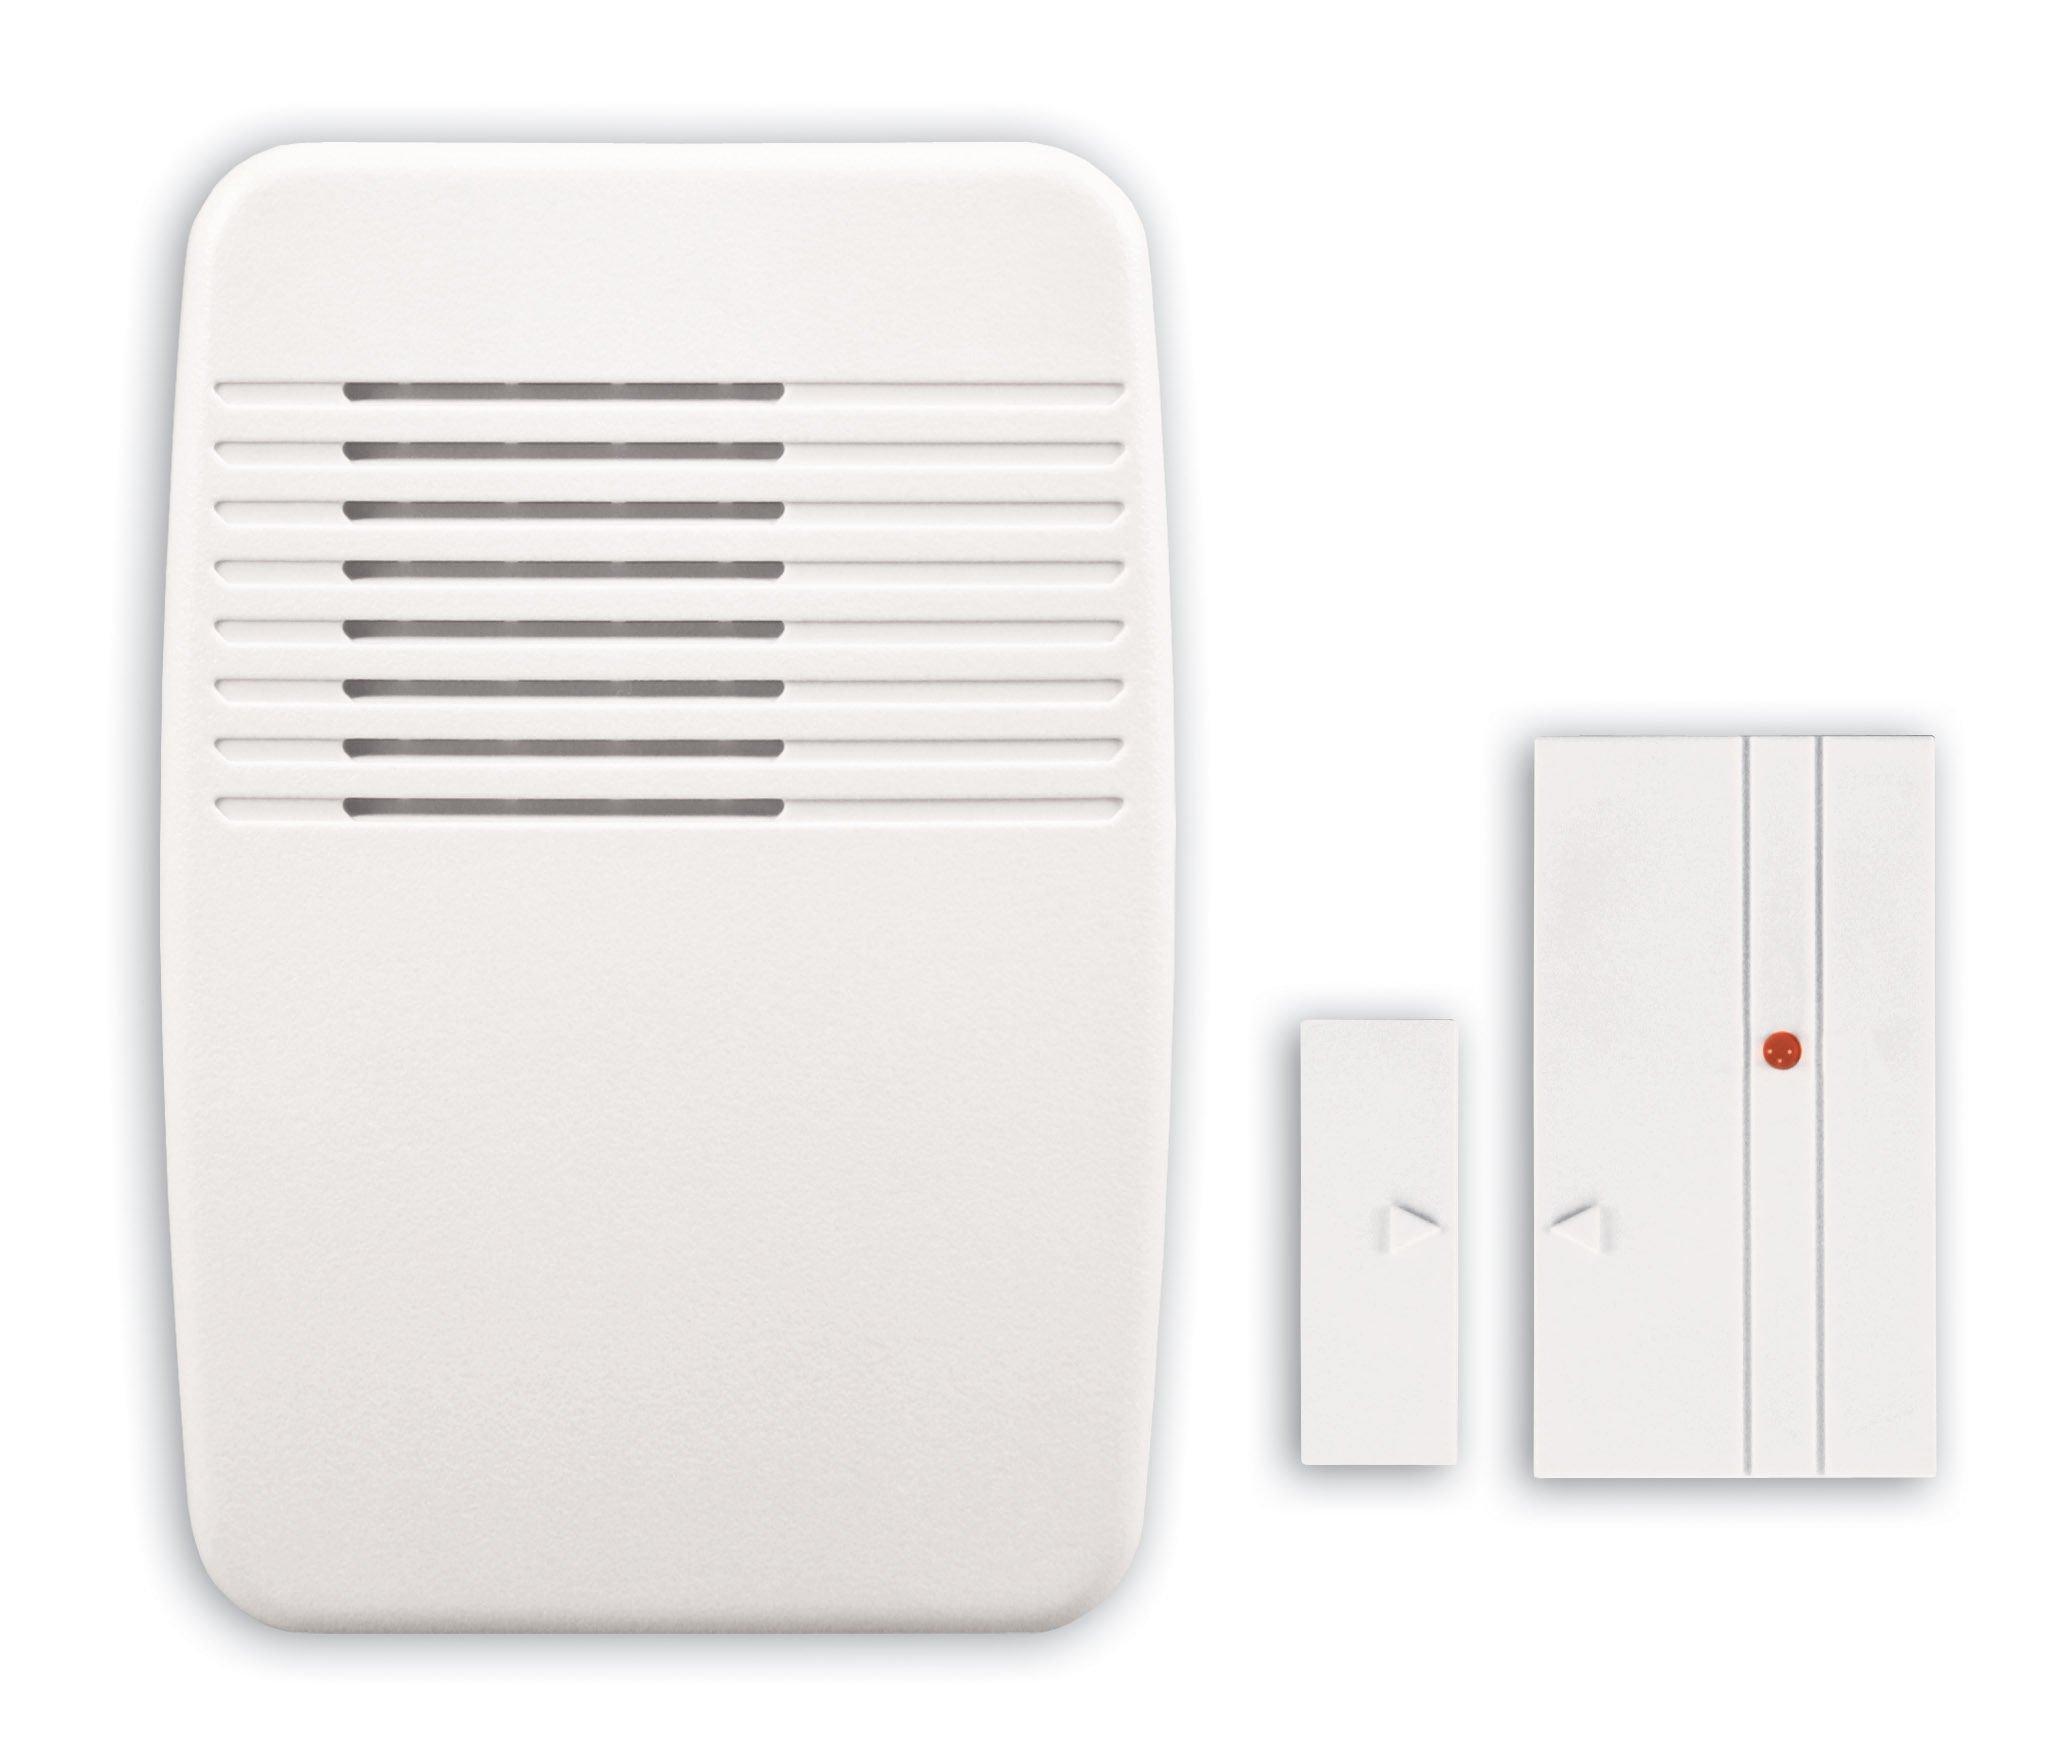 Heath Zenith Sl-7368-02 Wireless Entry Alert Chime White Multi-Function Kit 2